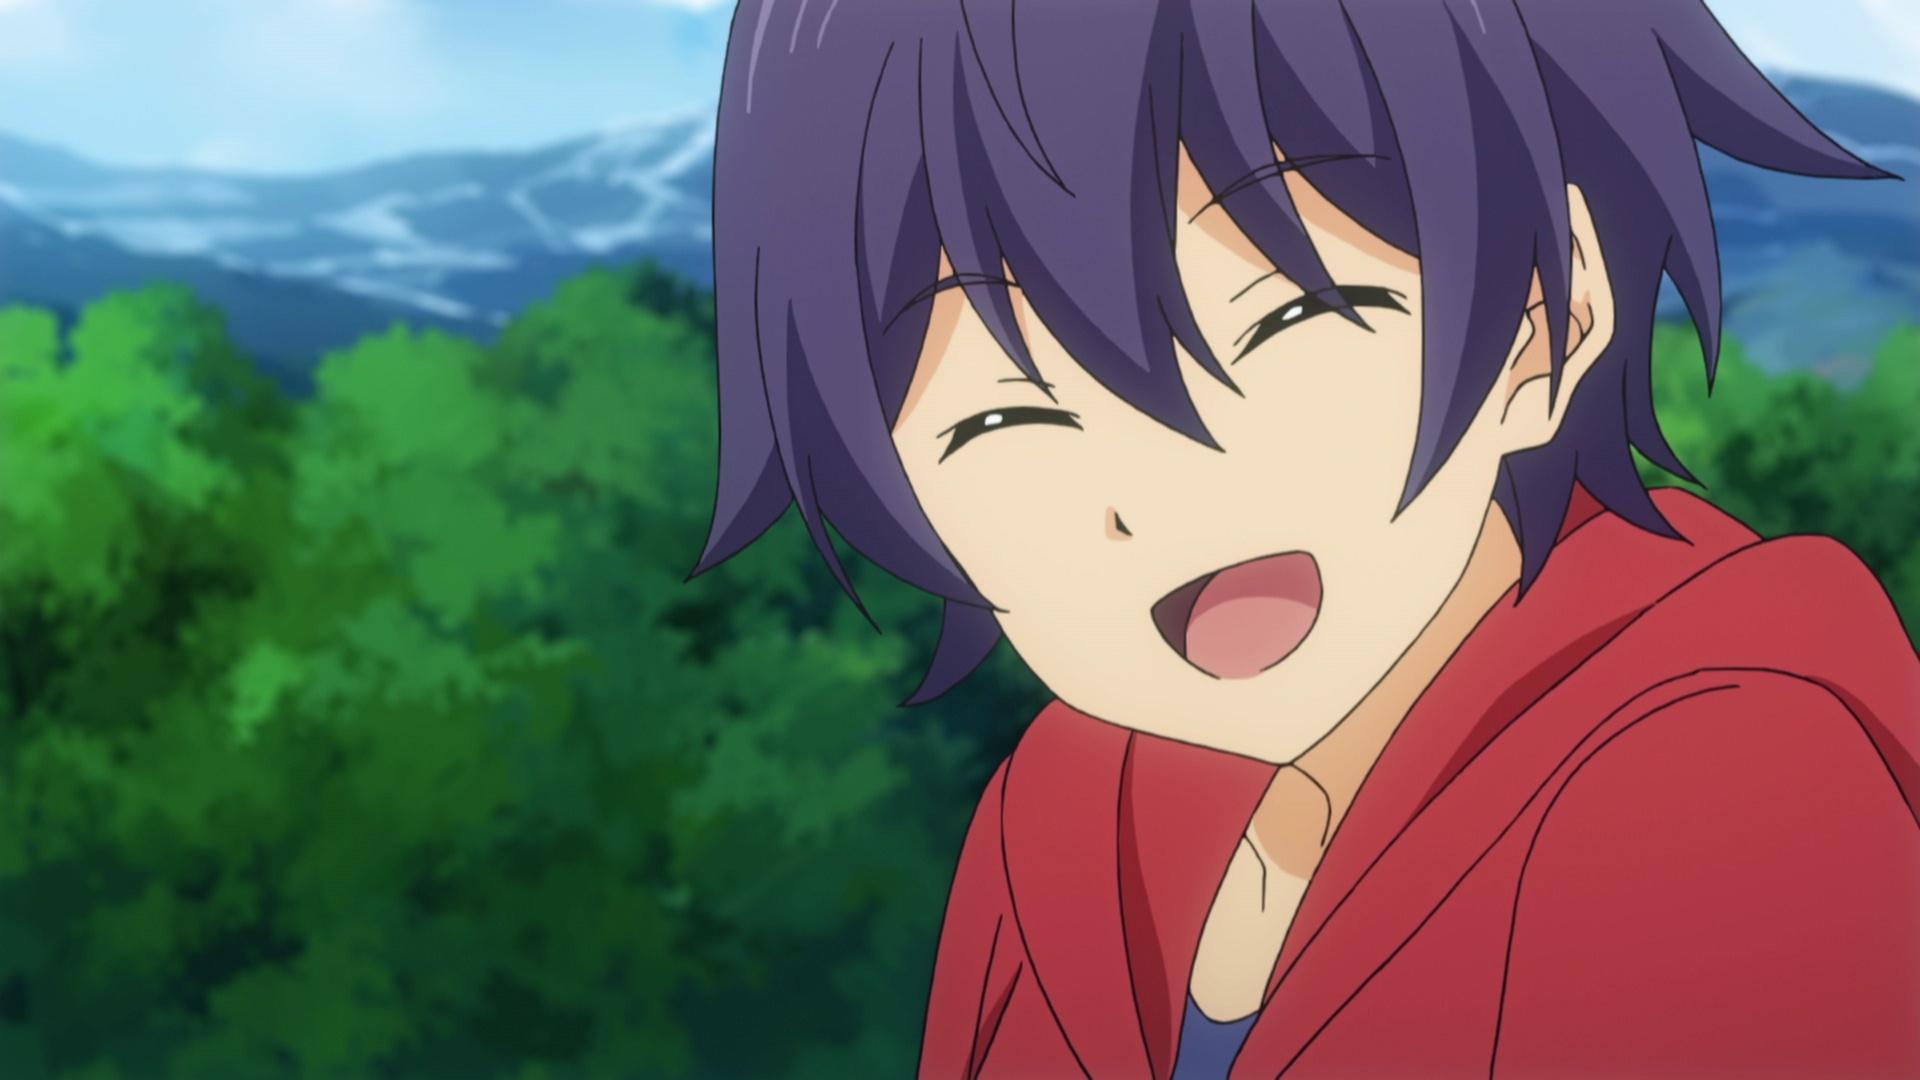 Watch Wise Man's Grandchild Season 1 Episode 1 Sub & Dub   Anime Simulcast   Funimation